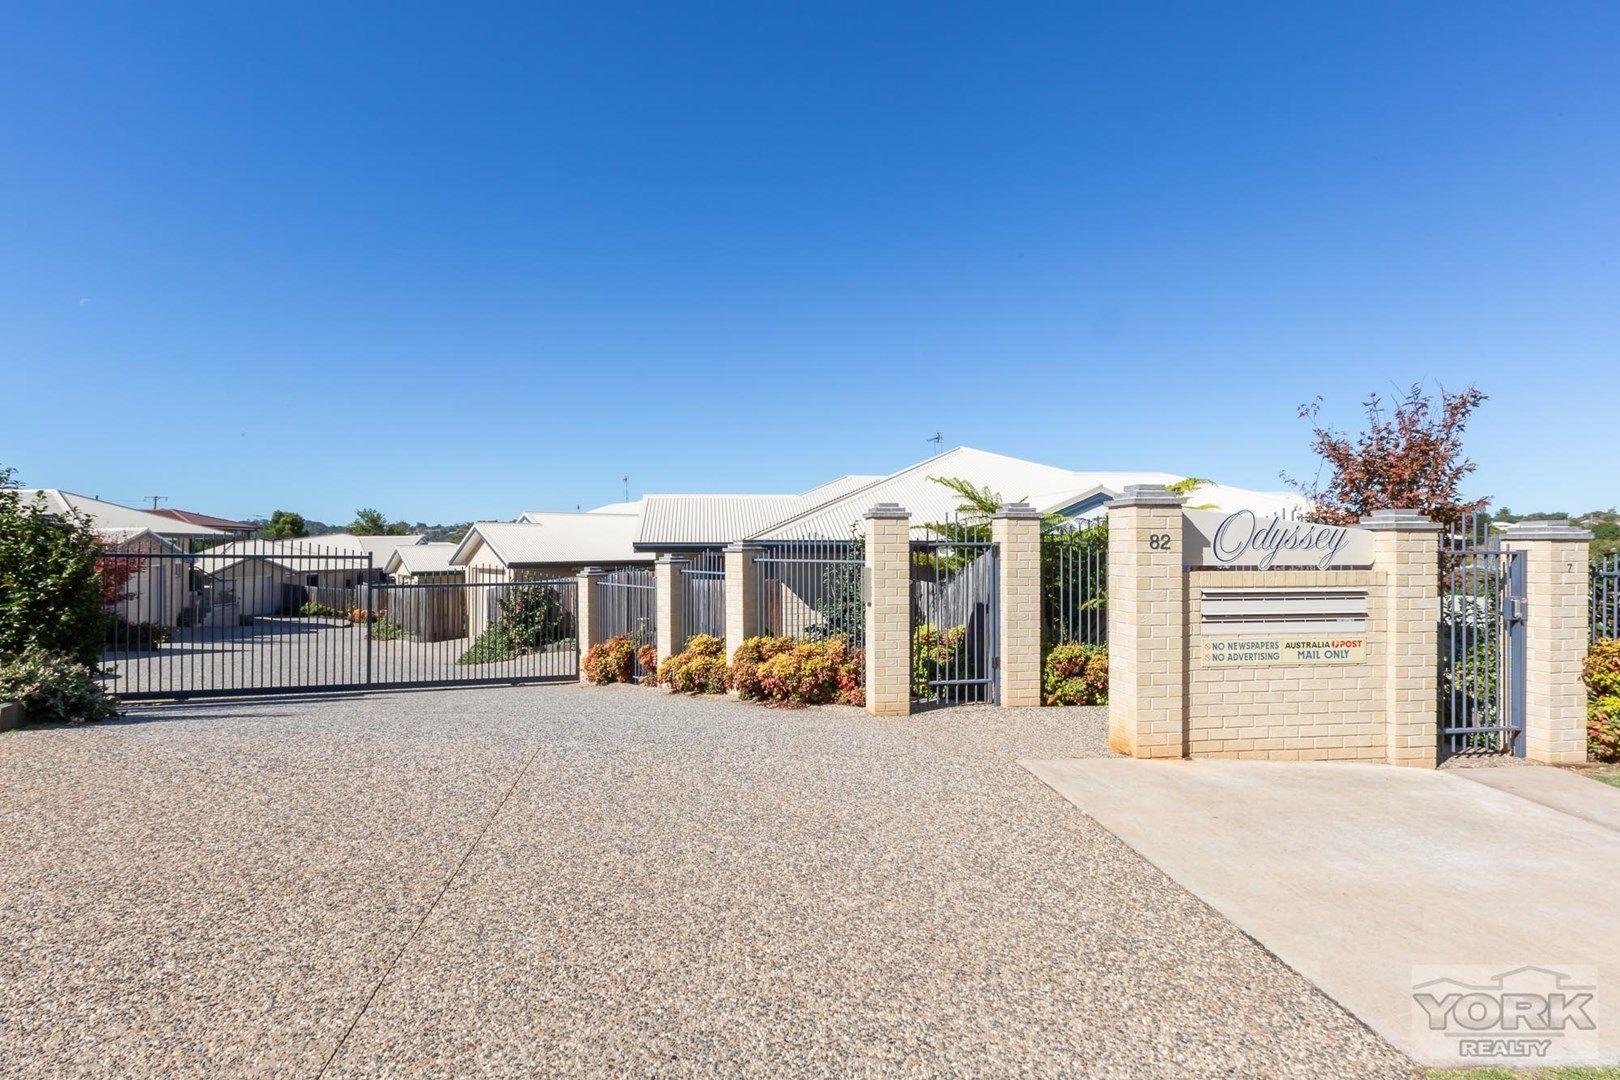 6/82 Holberton Street, Rockville QLD 4350, Image 0